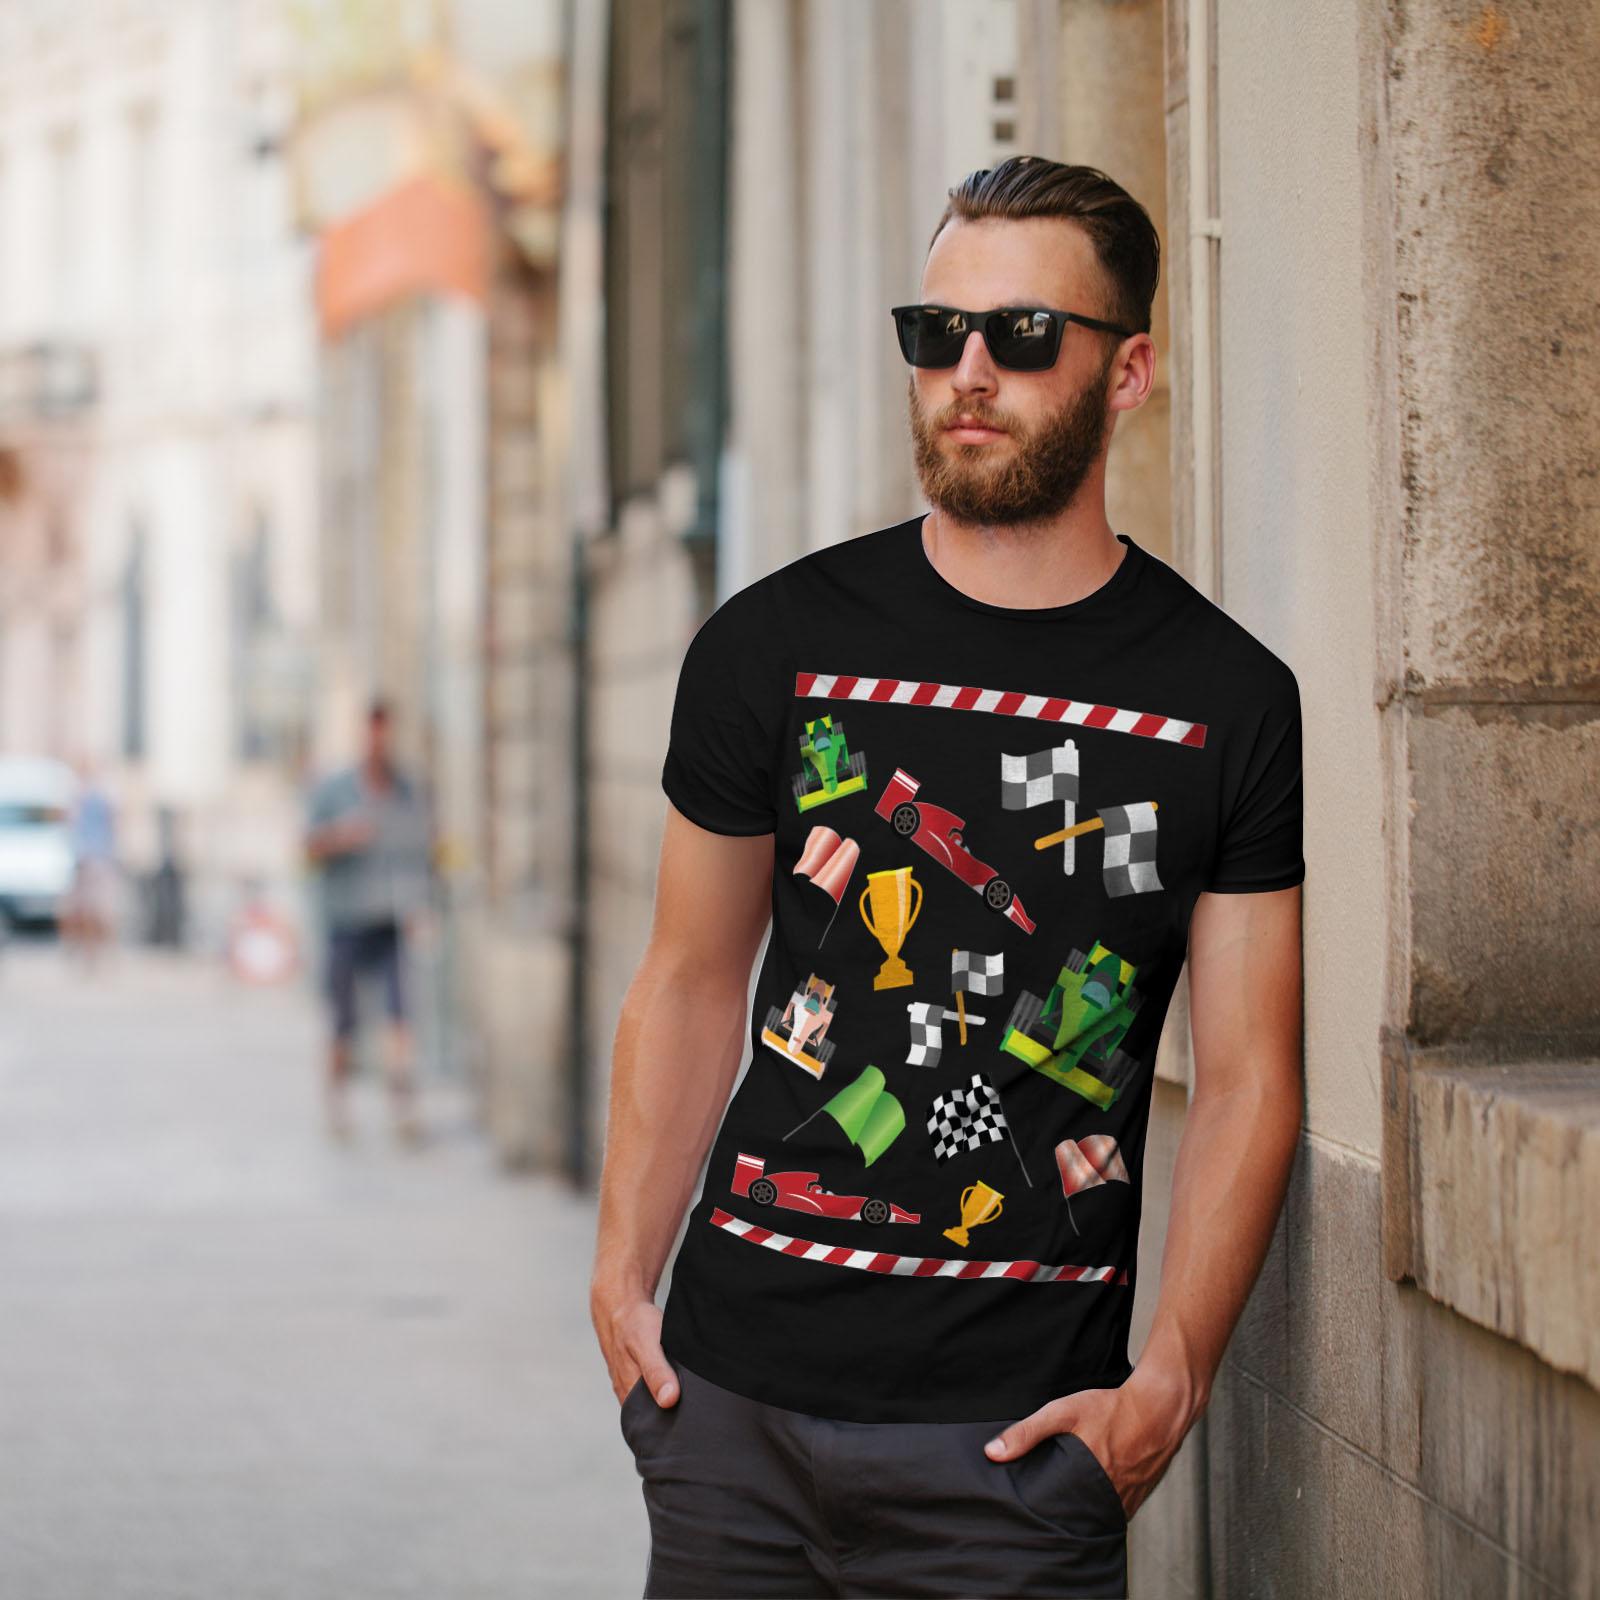 Pattern Graphic Design Printed Tee Wellcoda Formula Racing Mens T-shirt